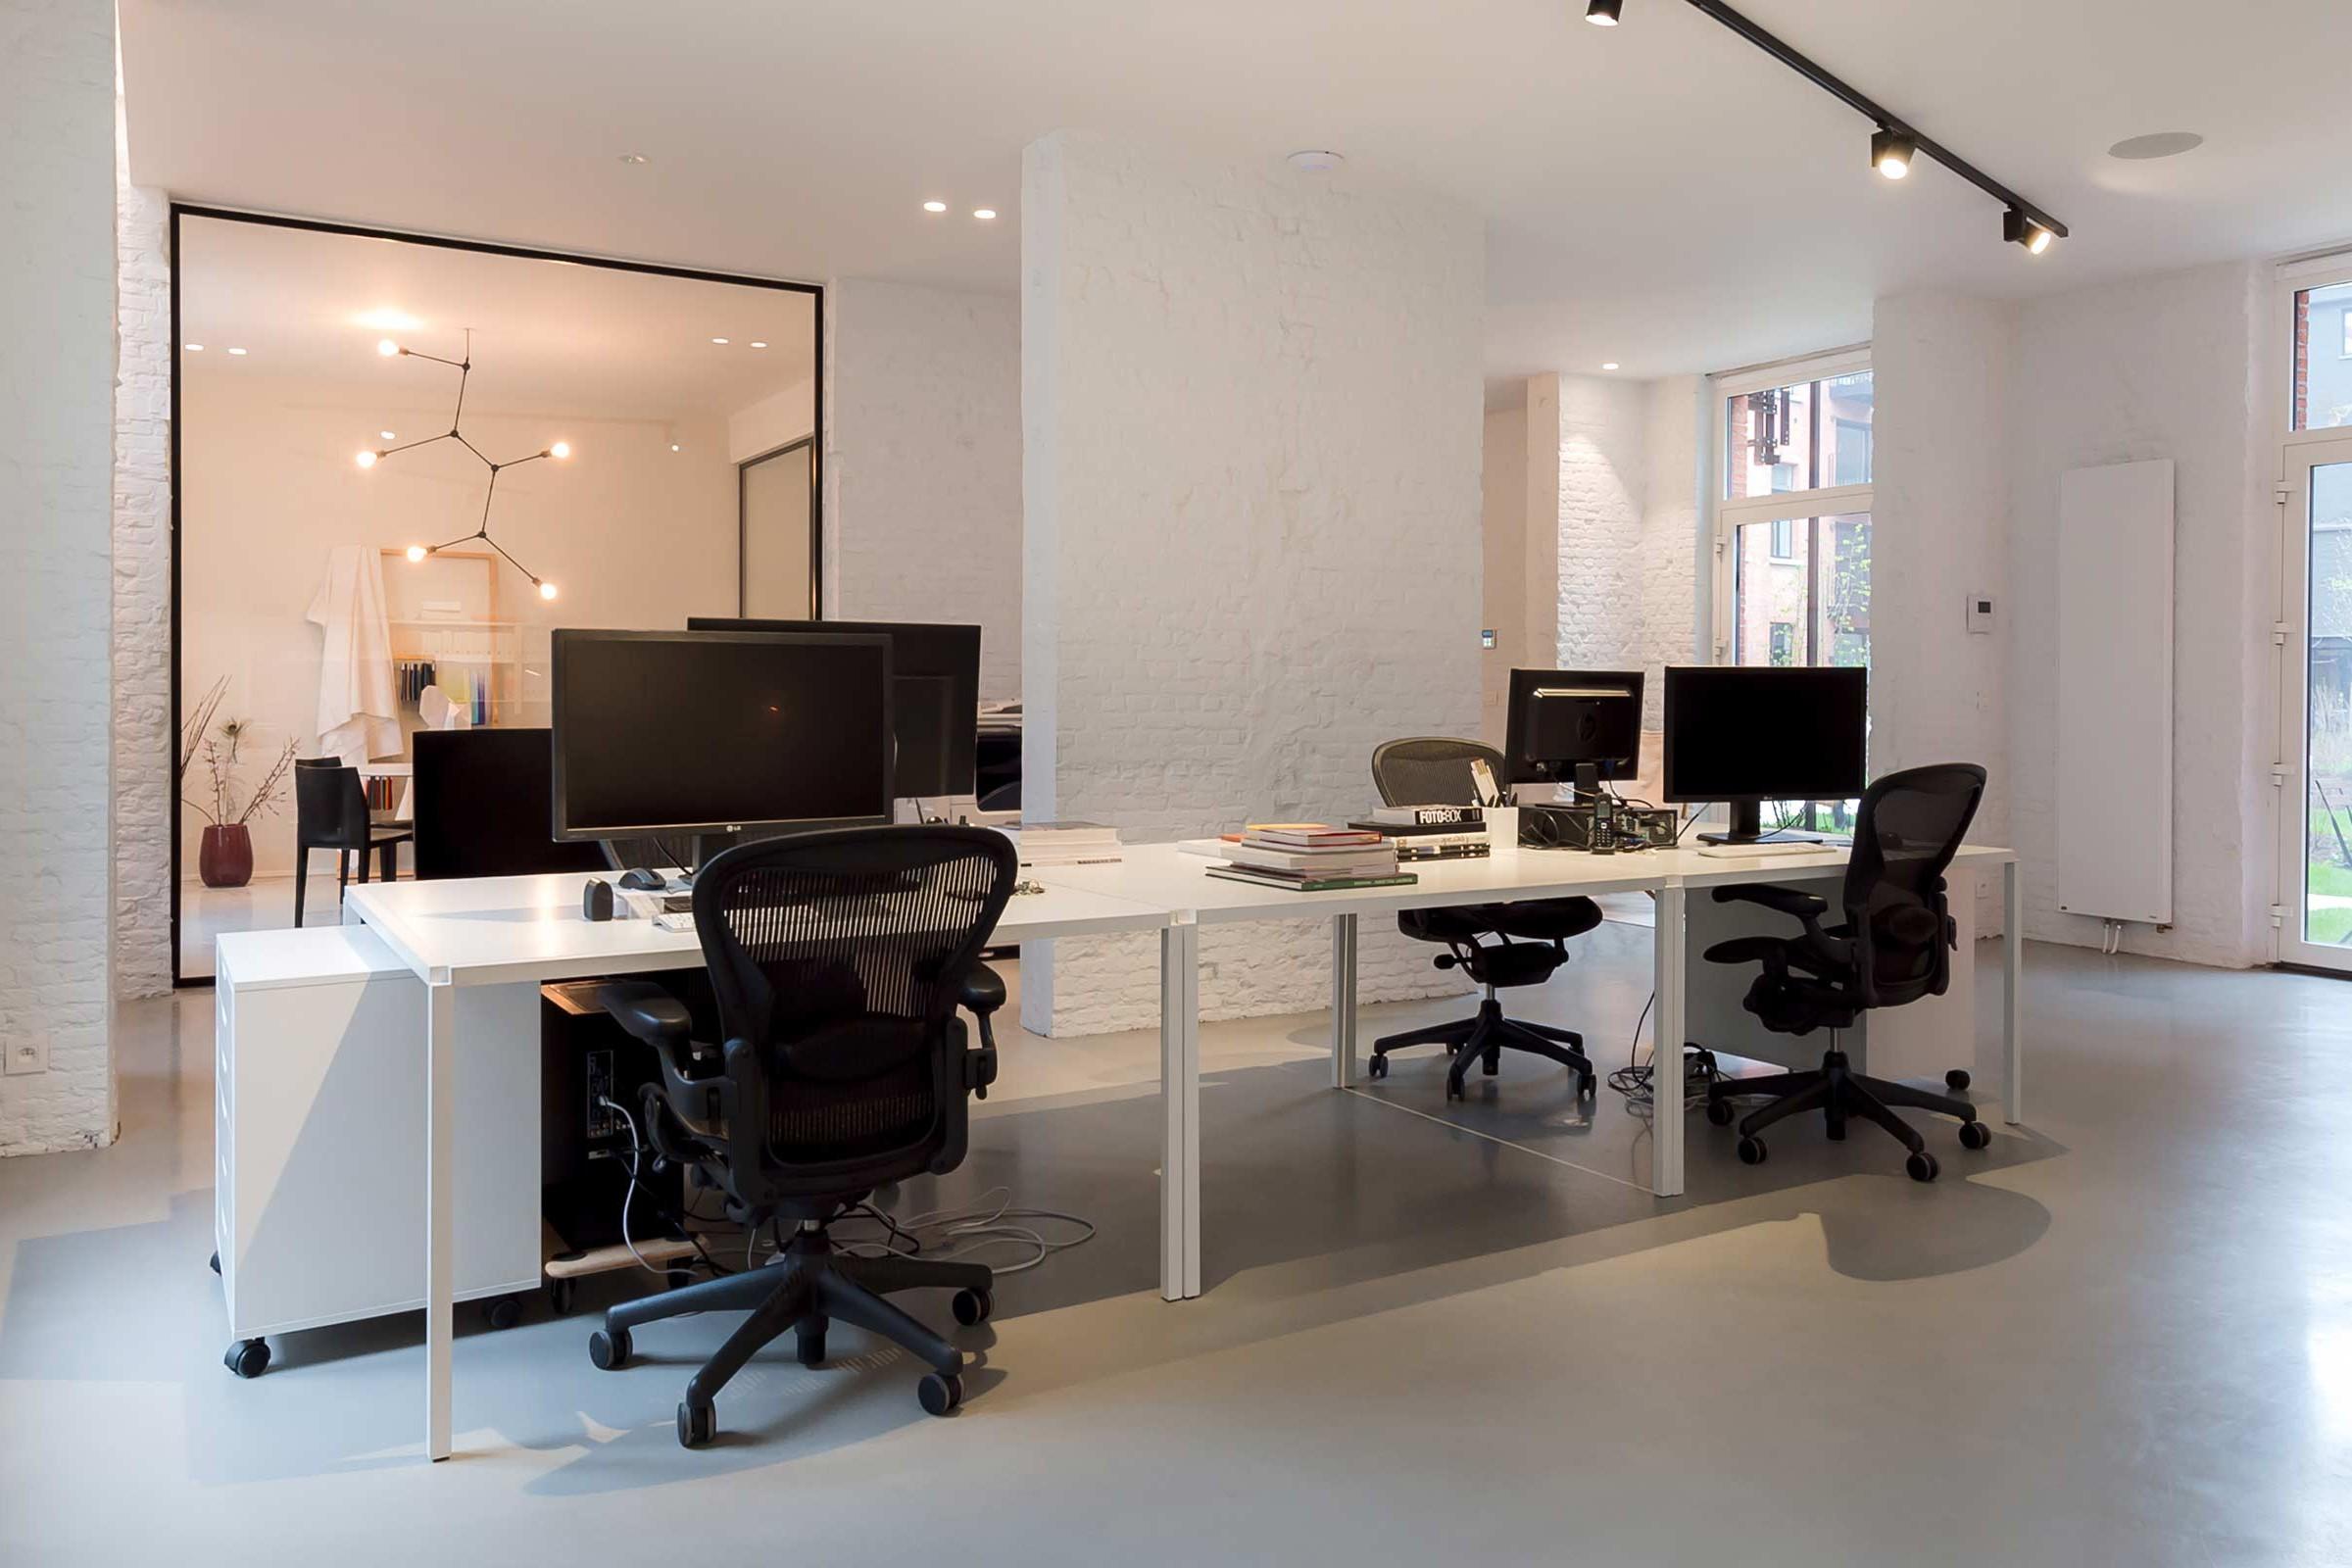 Studio Tolleneer - Office Antwerpen - Rijkswachtkazerne - MDF Italia Tense table tafel - Hermann Miller Aeron chair bureaustoel